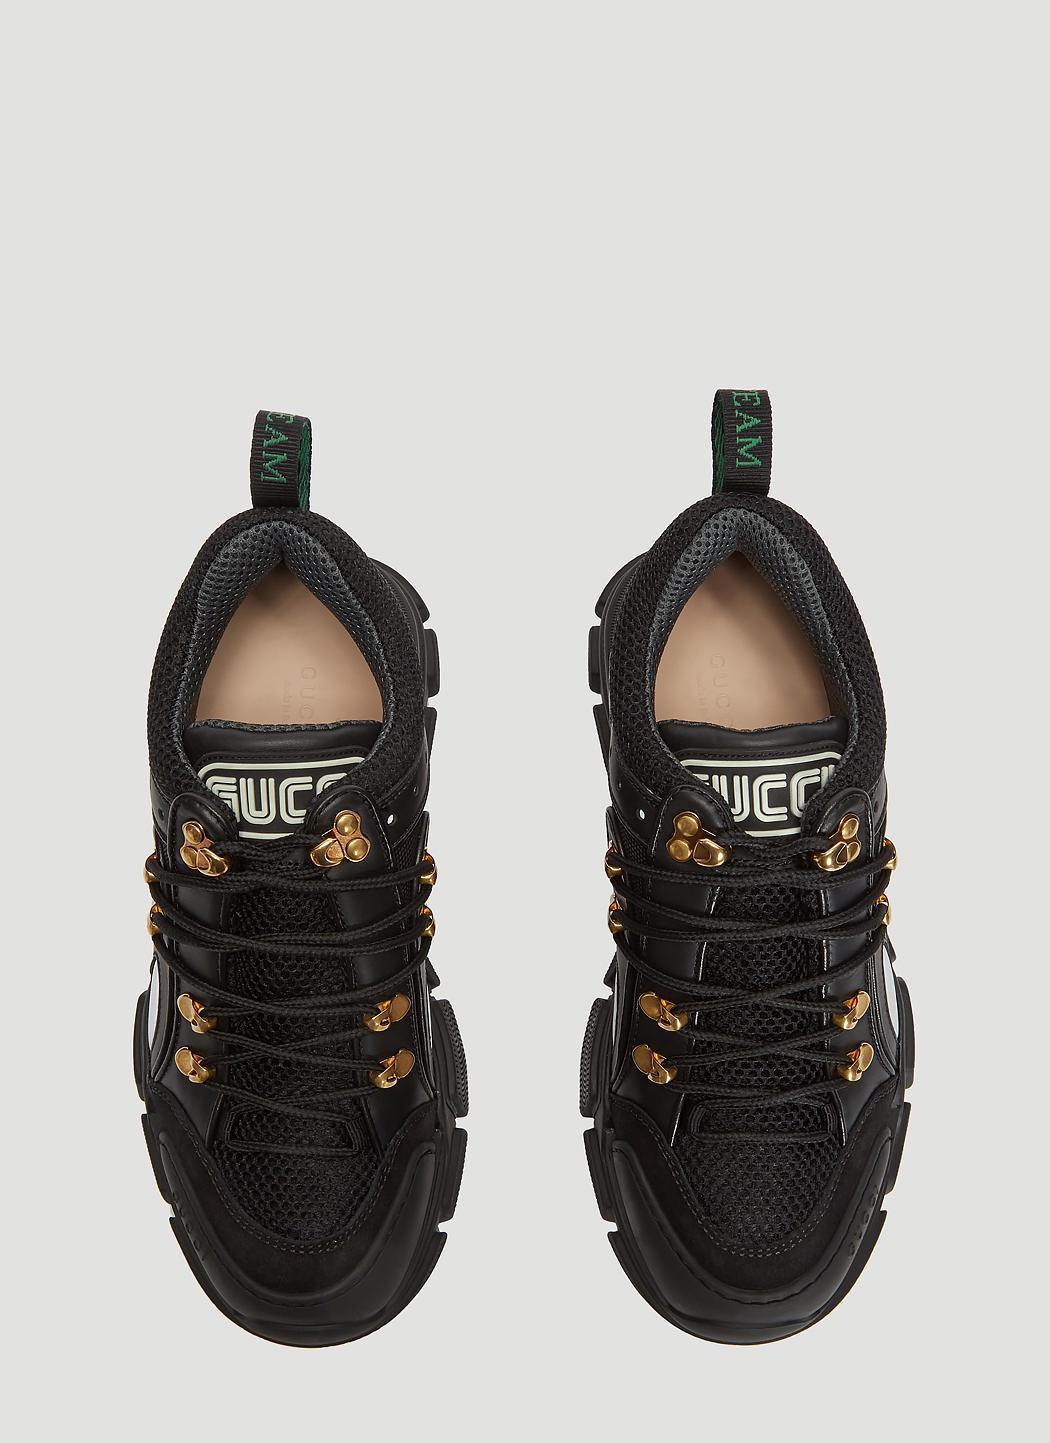 c1f55243afa1 Gucci - Black Chunky Flashtrek Sneakers - Lyst. View fullscreen